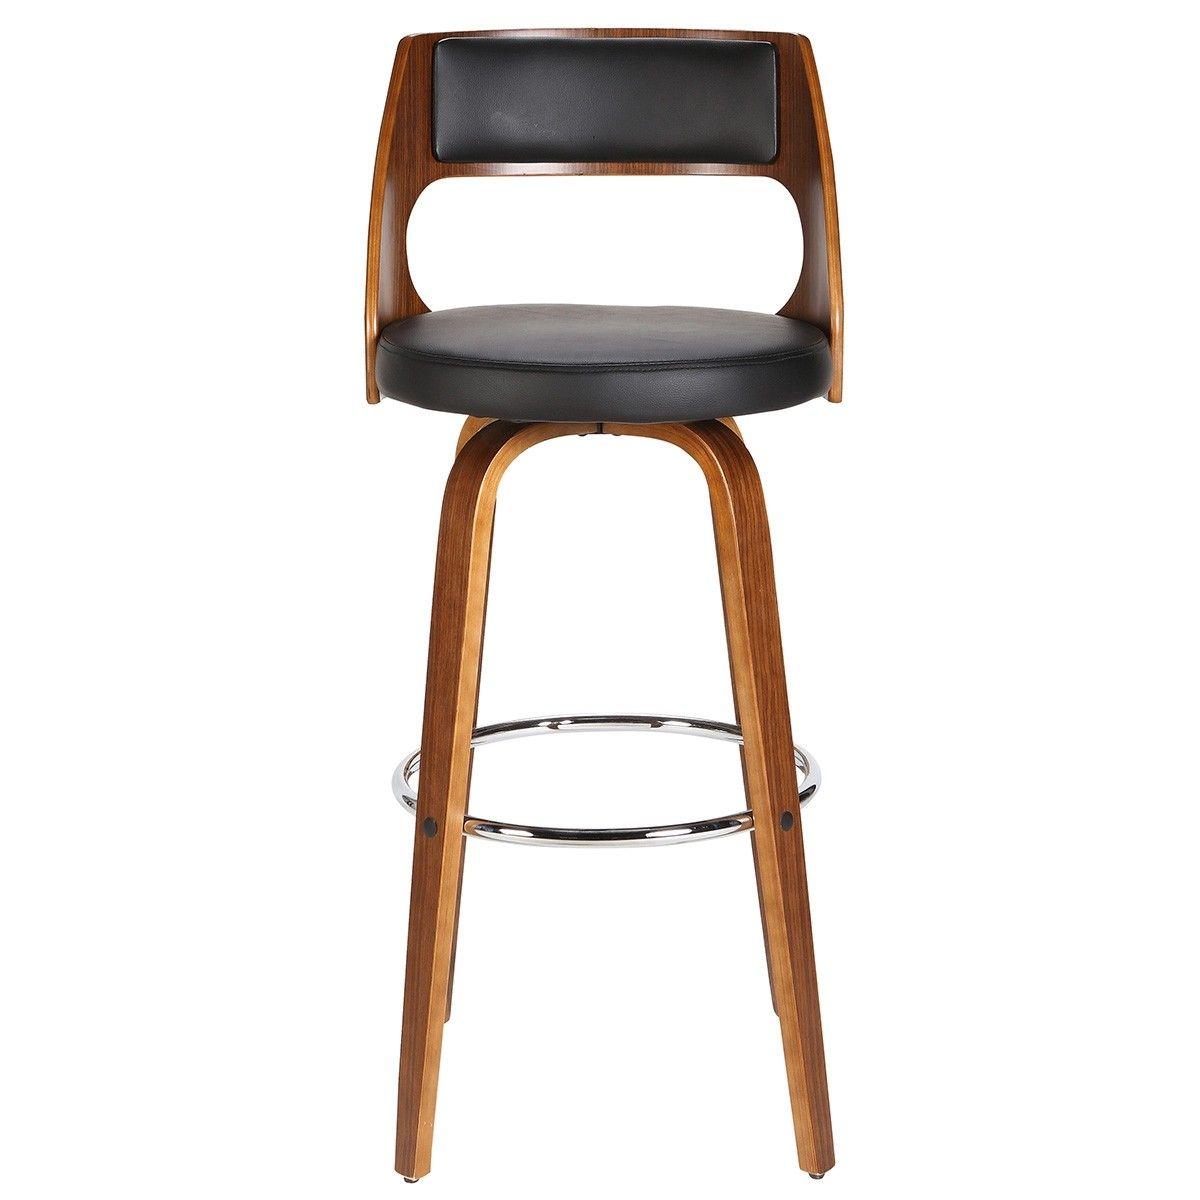 Super Brakel Wooden Swivel Counter Stool With Pu Seat Black Machost Co Dining Chair Design Ideas Machostcouk